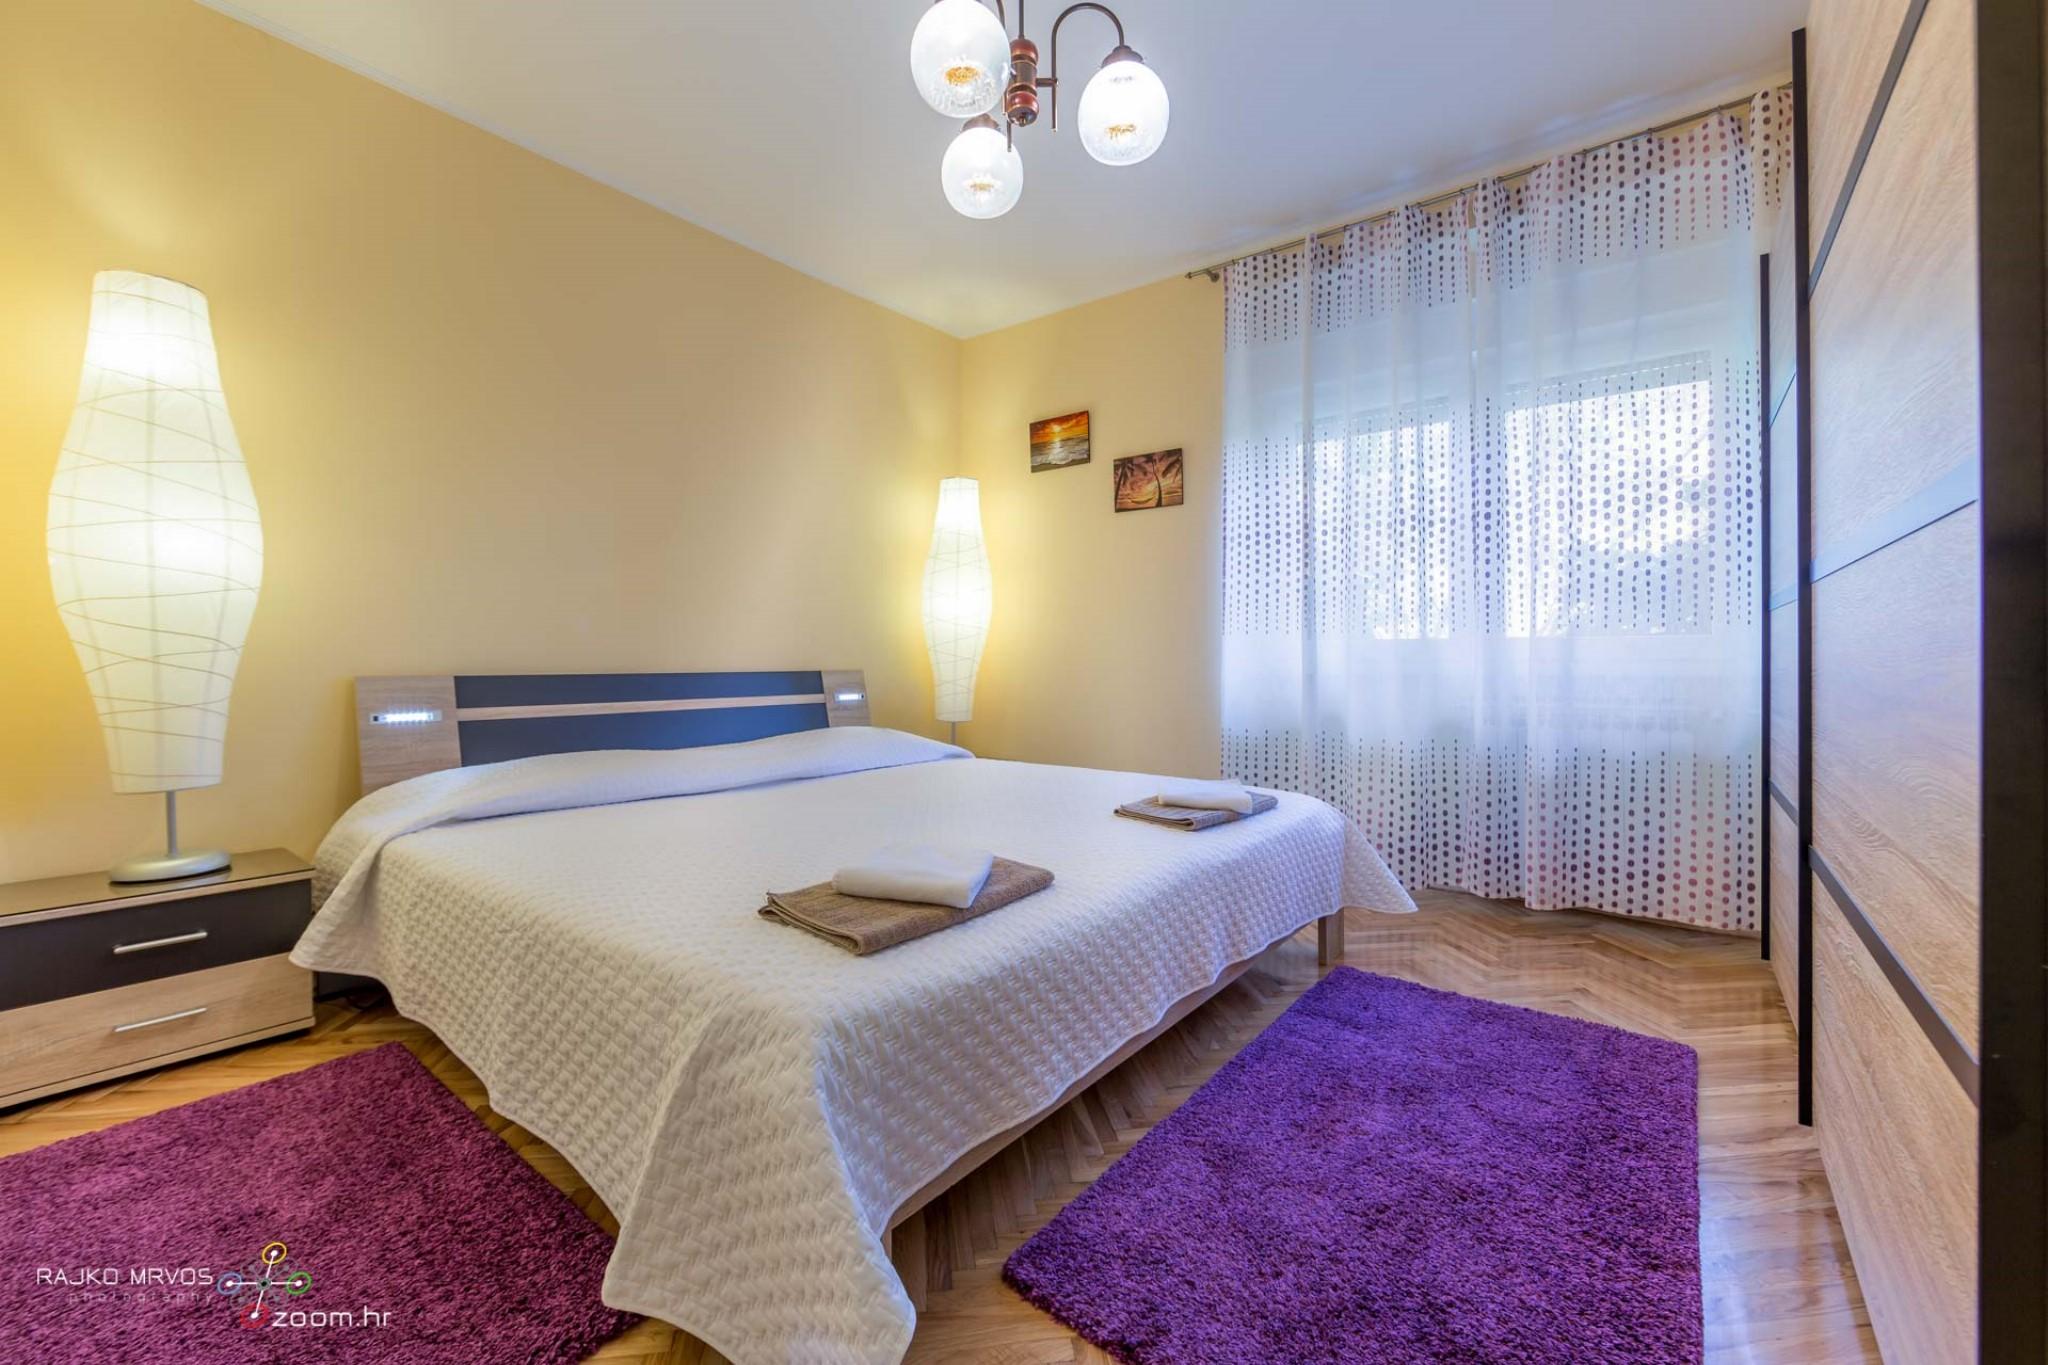 fotografiranje-interijera-fotograf-eksterijera-vila-apartmana-kuca-apartmani-Dujmic-22